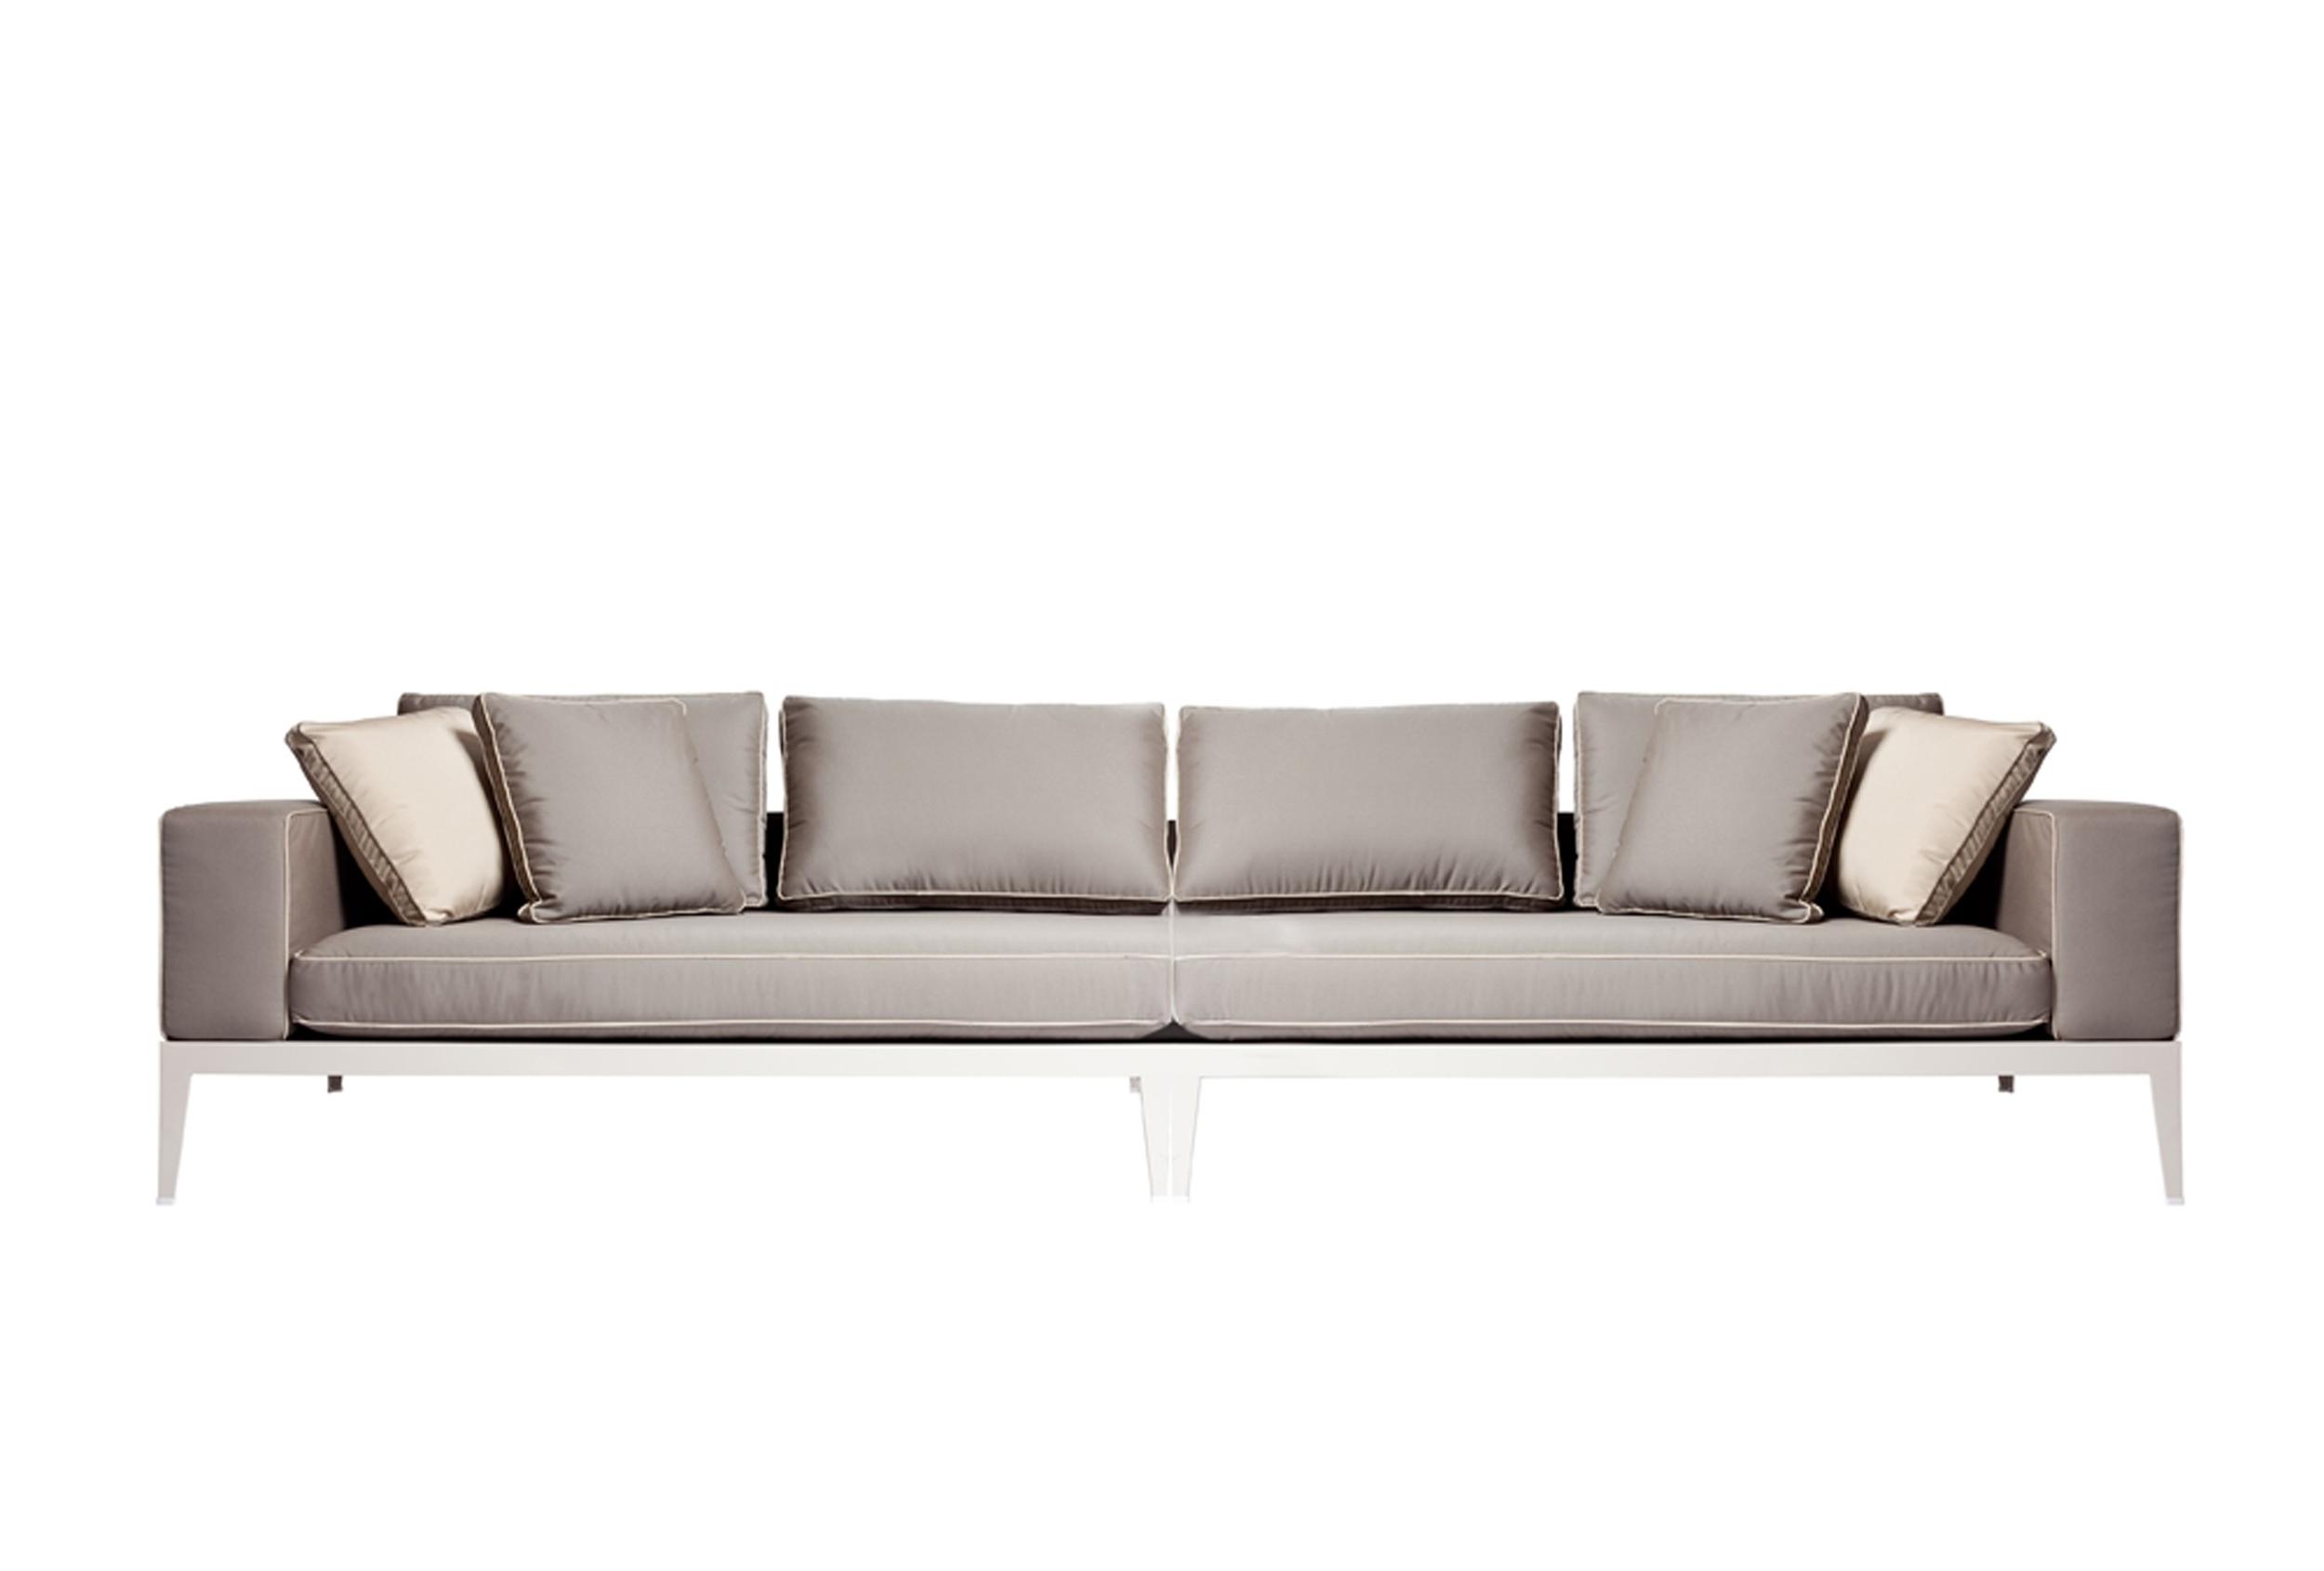 Balmoral 4 Seater Sofa (View 7 of 15)